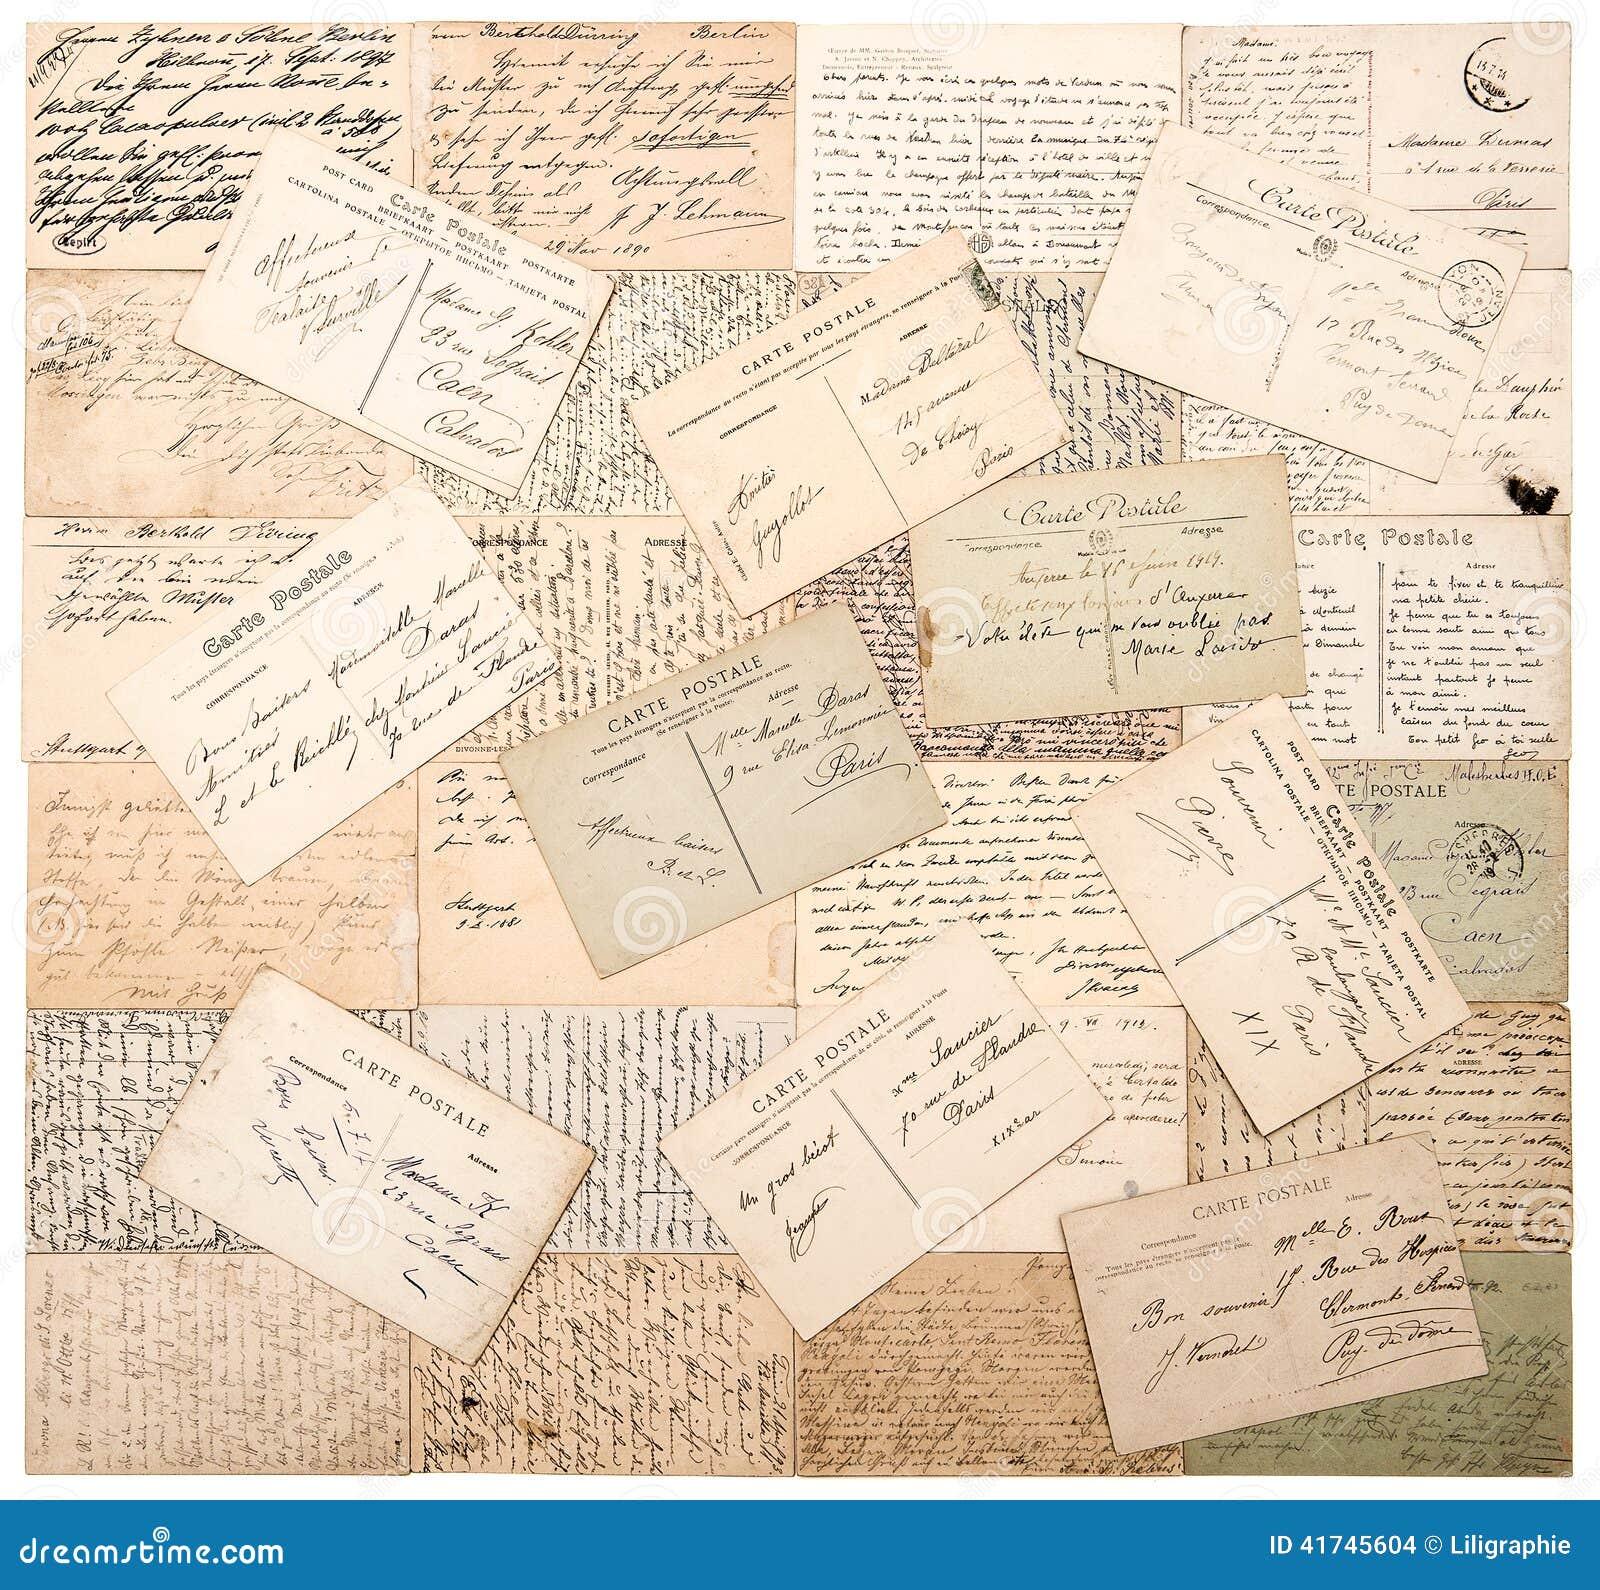 Italian handwritten postcard letter stock photo image 39254147 - Vintage Postcards Handwritten Undefined Texts Stock Images